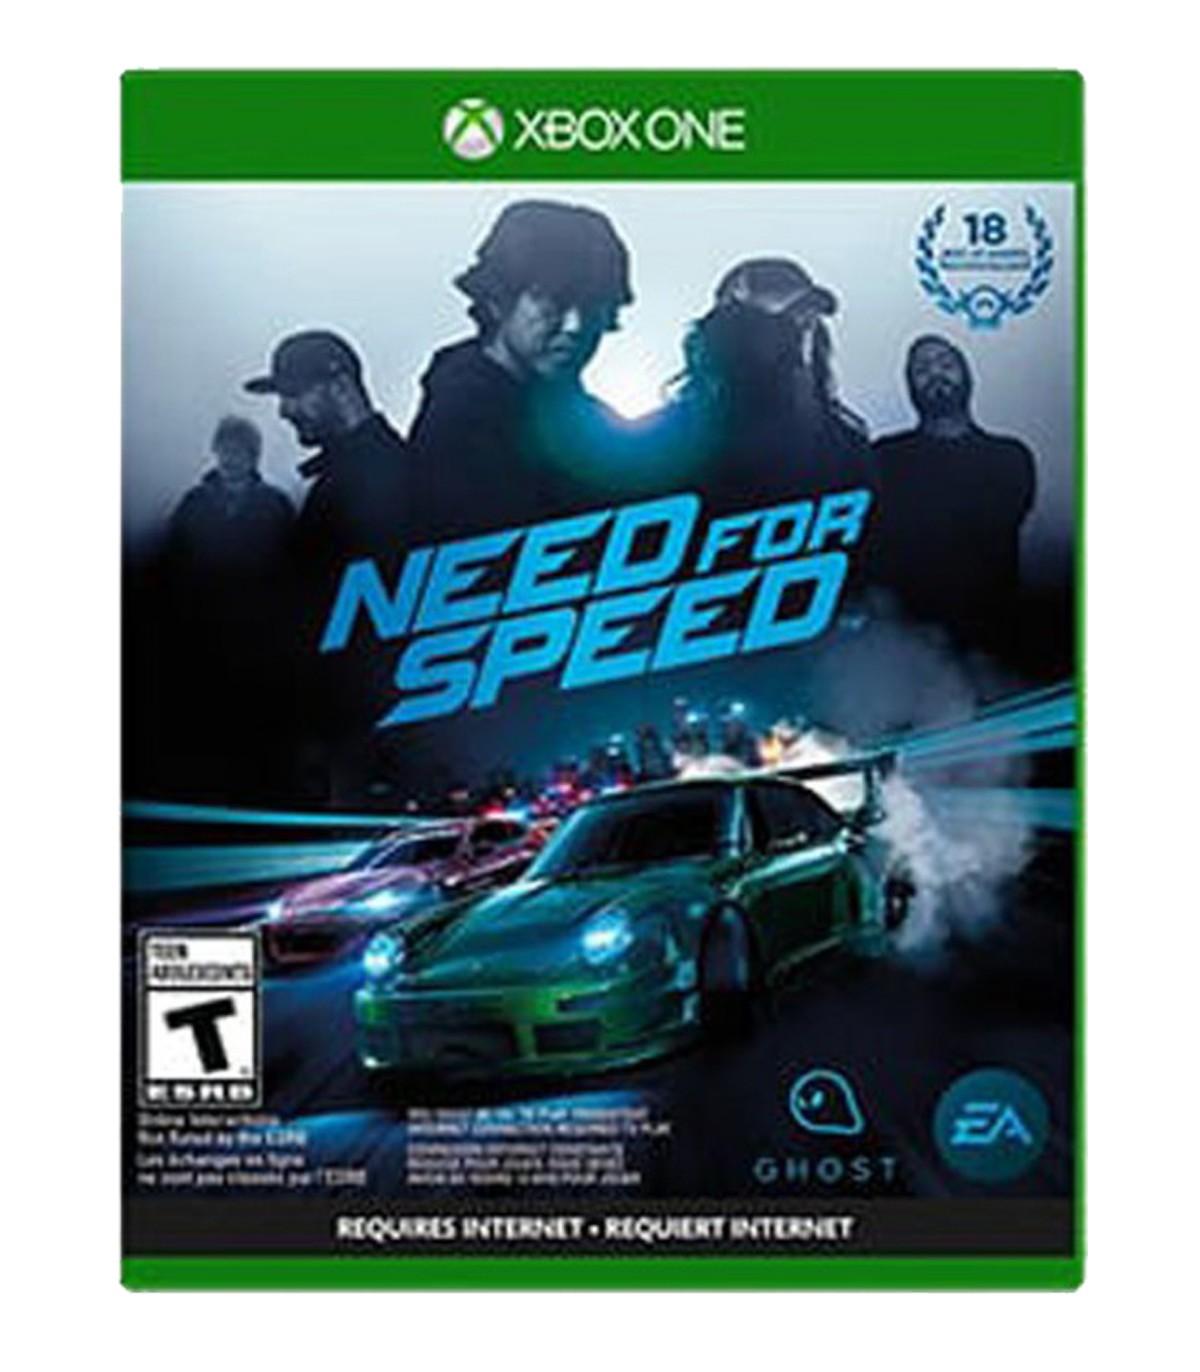 بازی Need For Speed - ایکس باکس وان